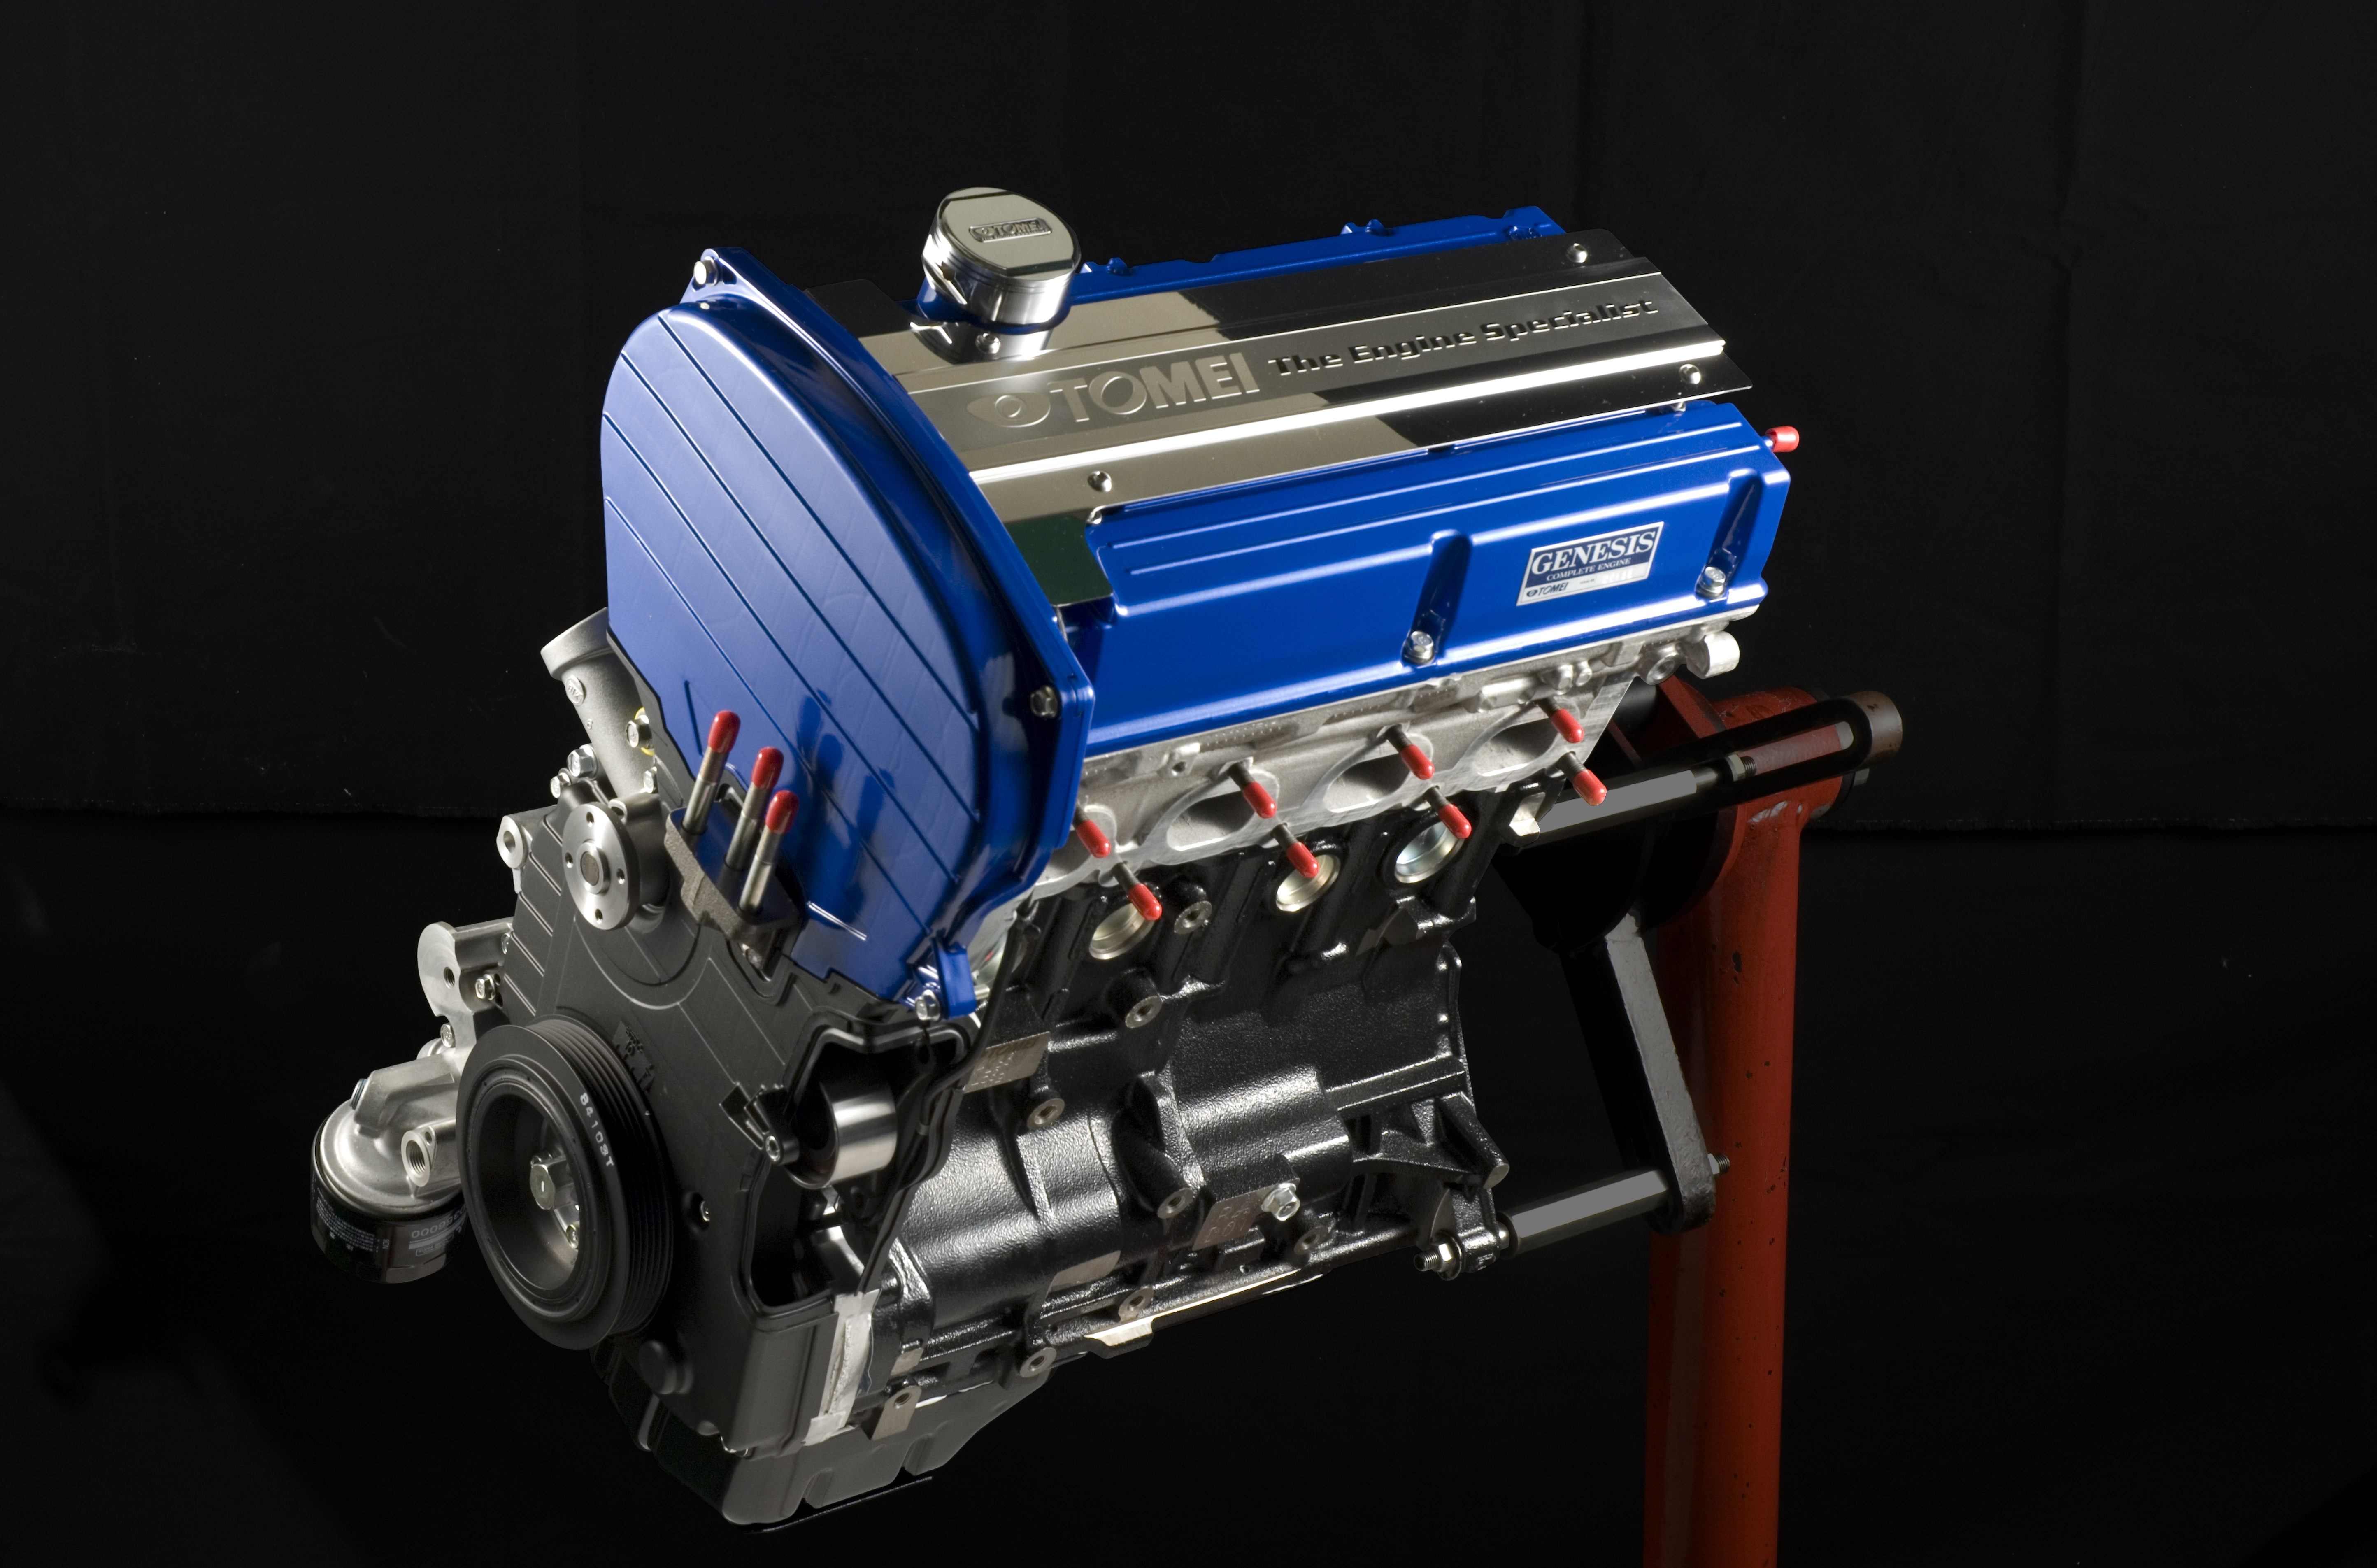 Tomei Genesis Complete Shortblock Assembly Mitsubishi Evolution IX